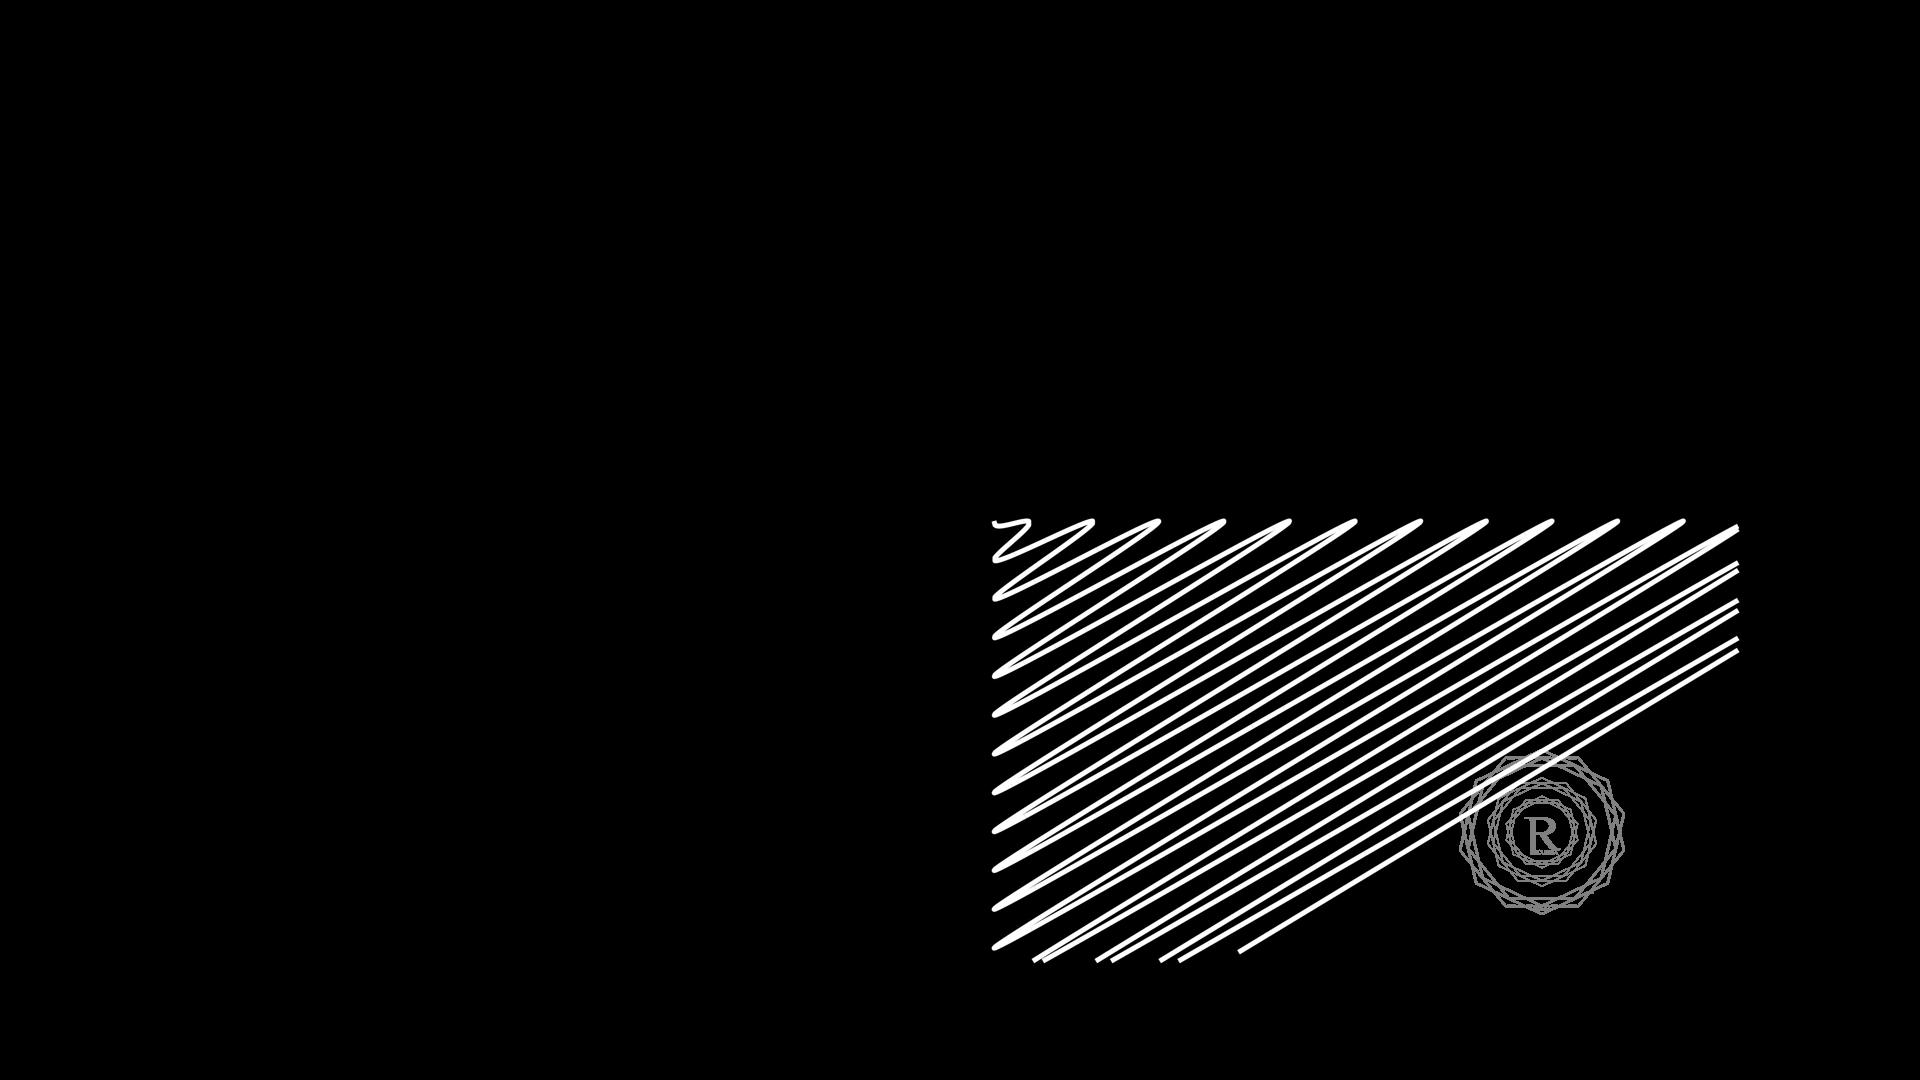 00078Resized_Geometry_copyright_Recursia